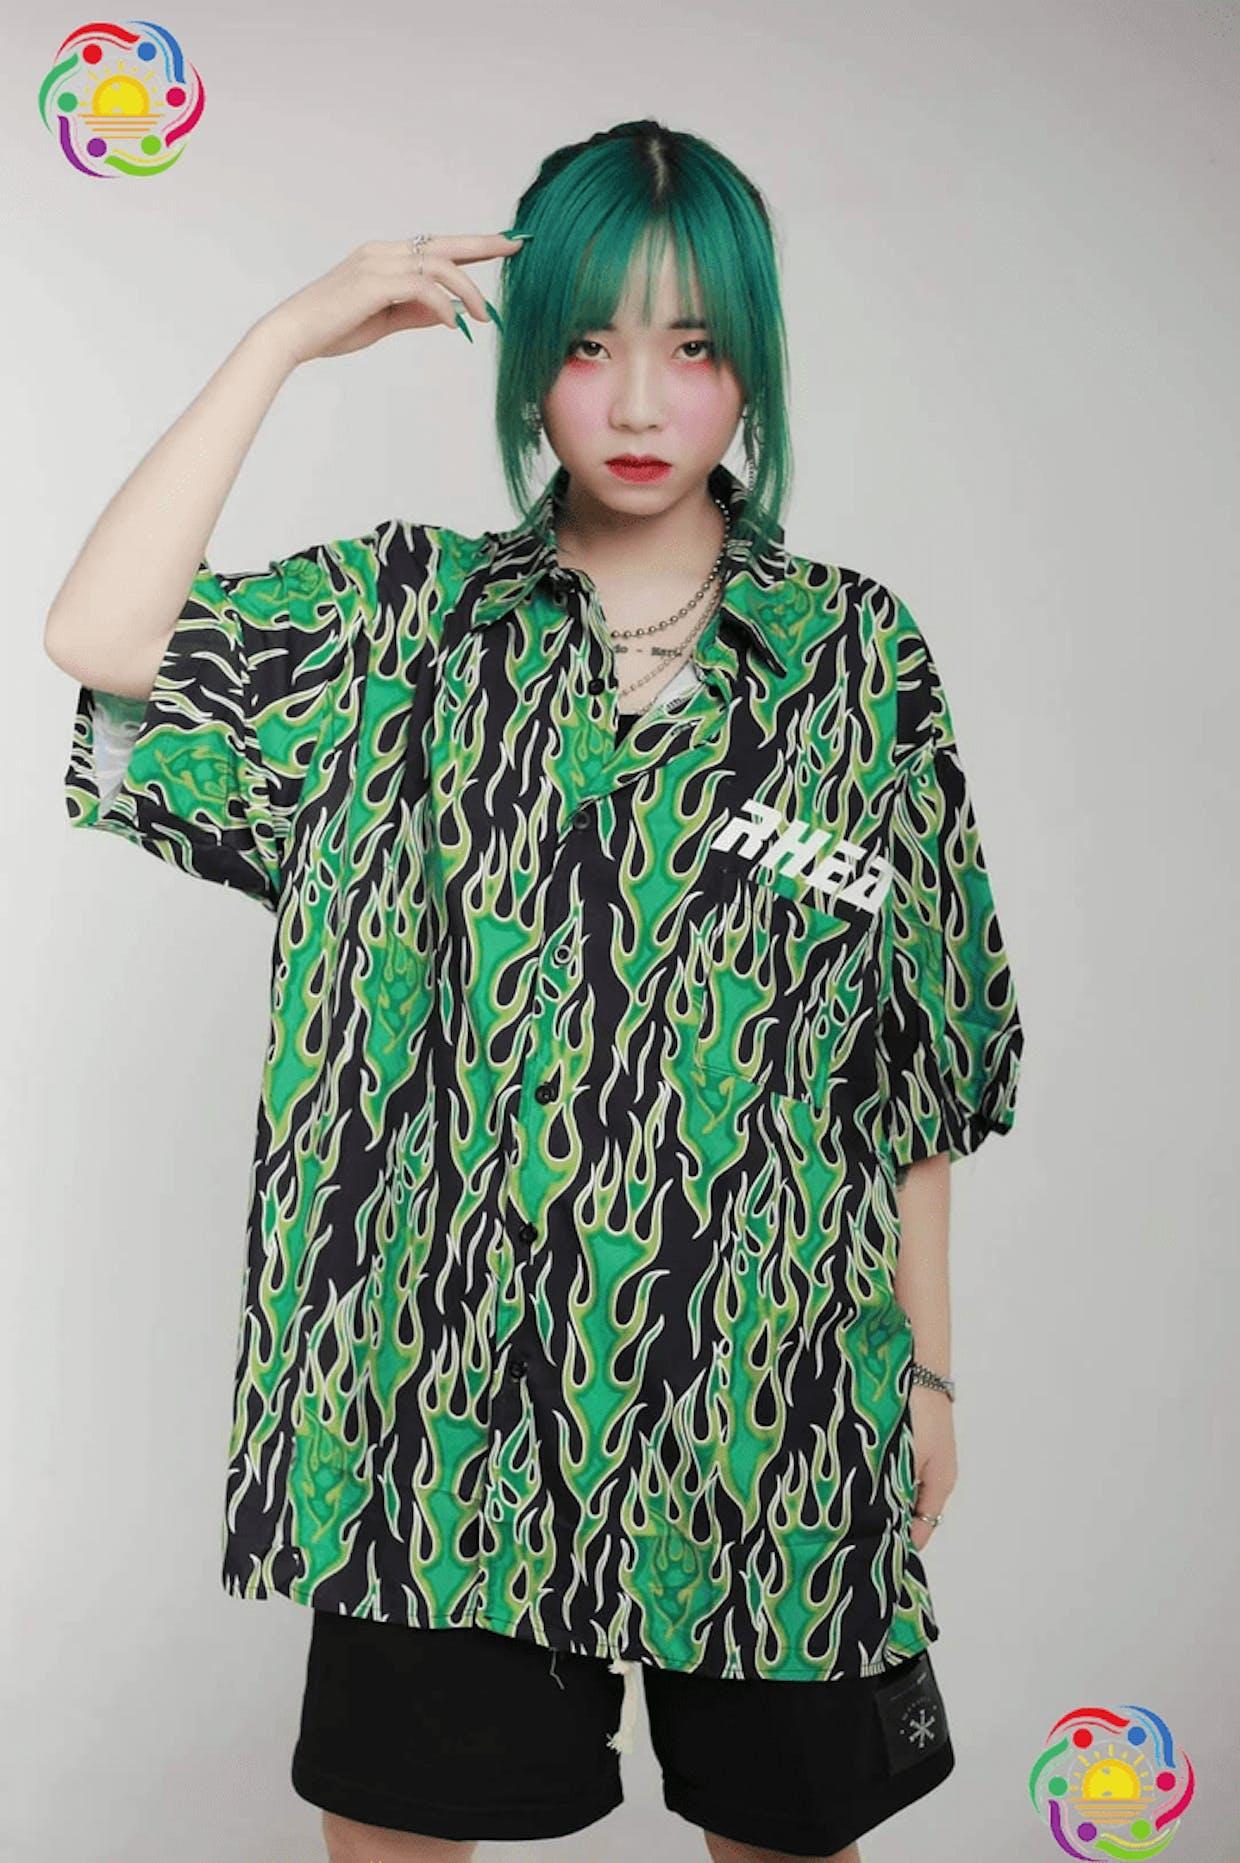 Rapper Trần Huyền Diệp - TenWe